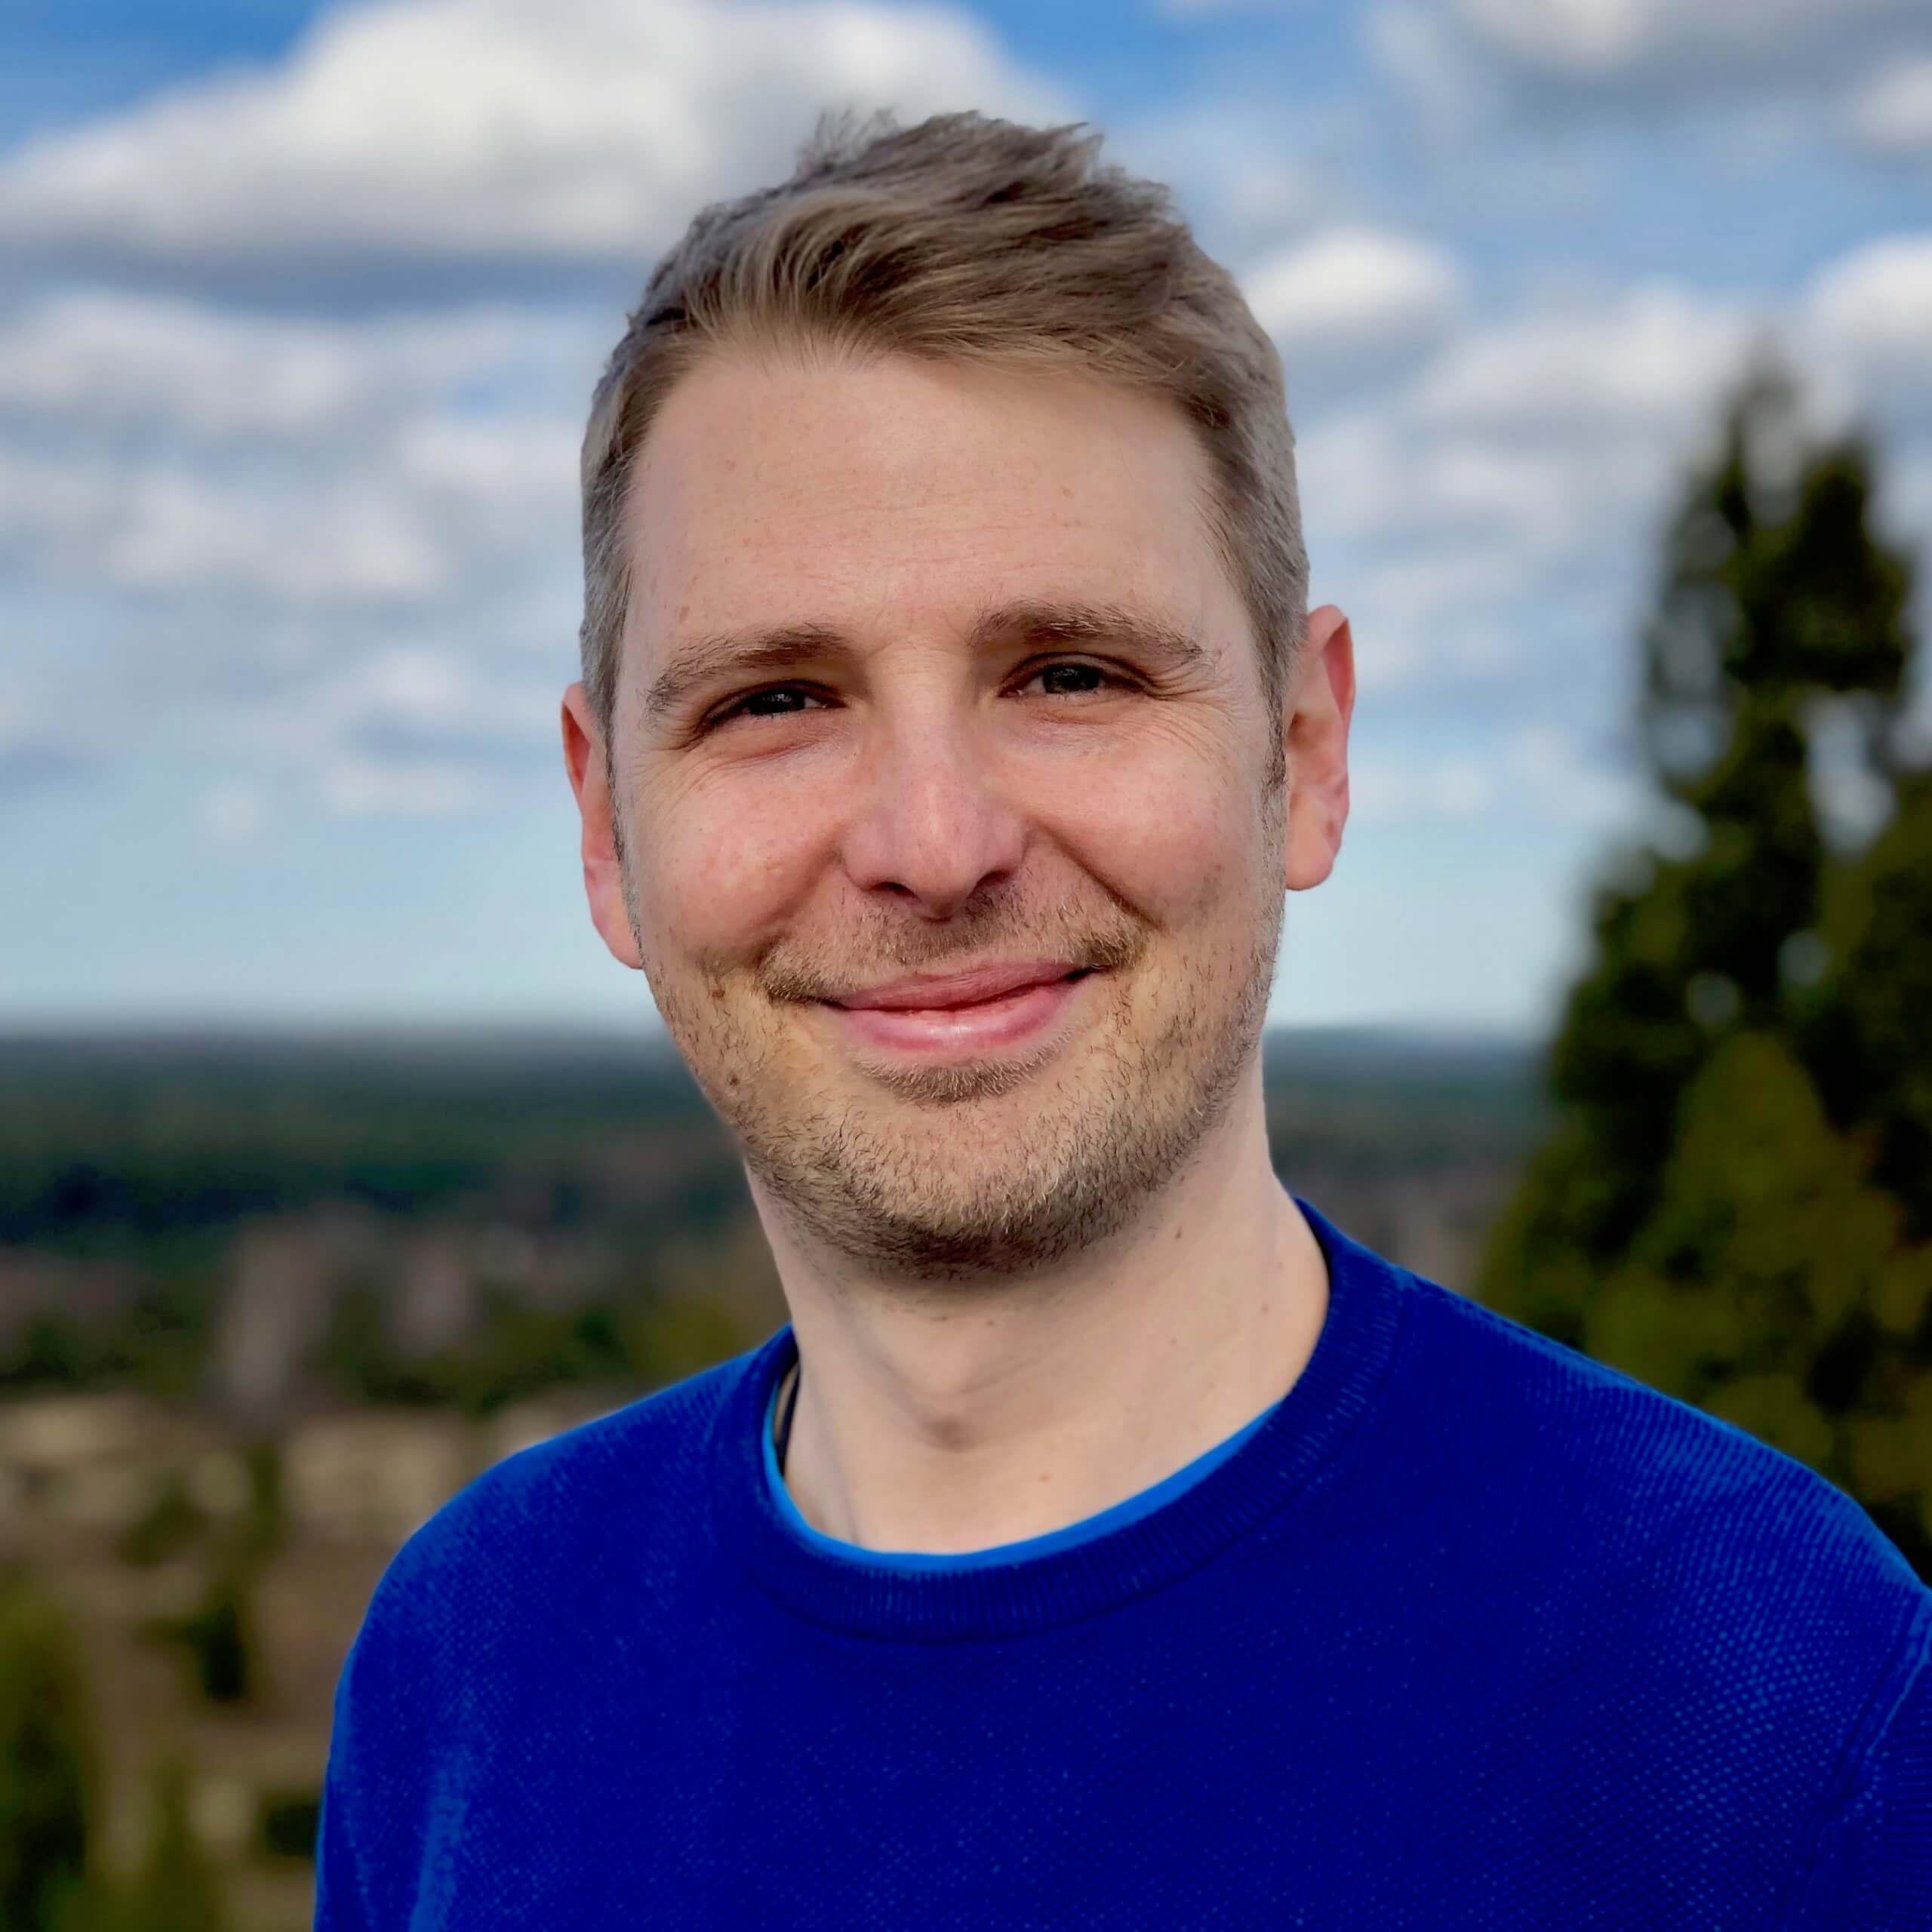 Tim Johannessen